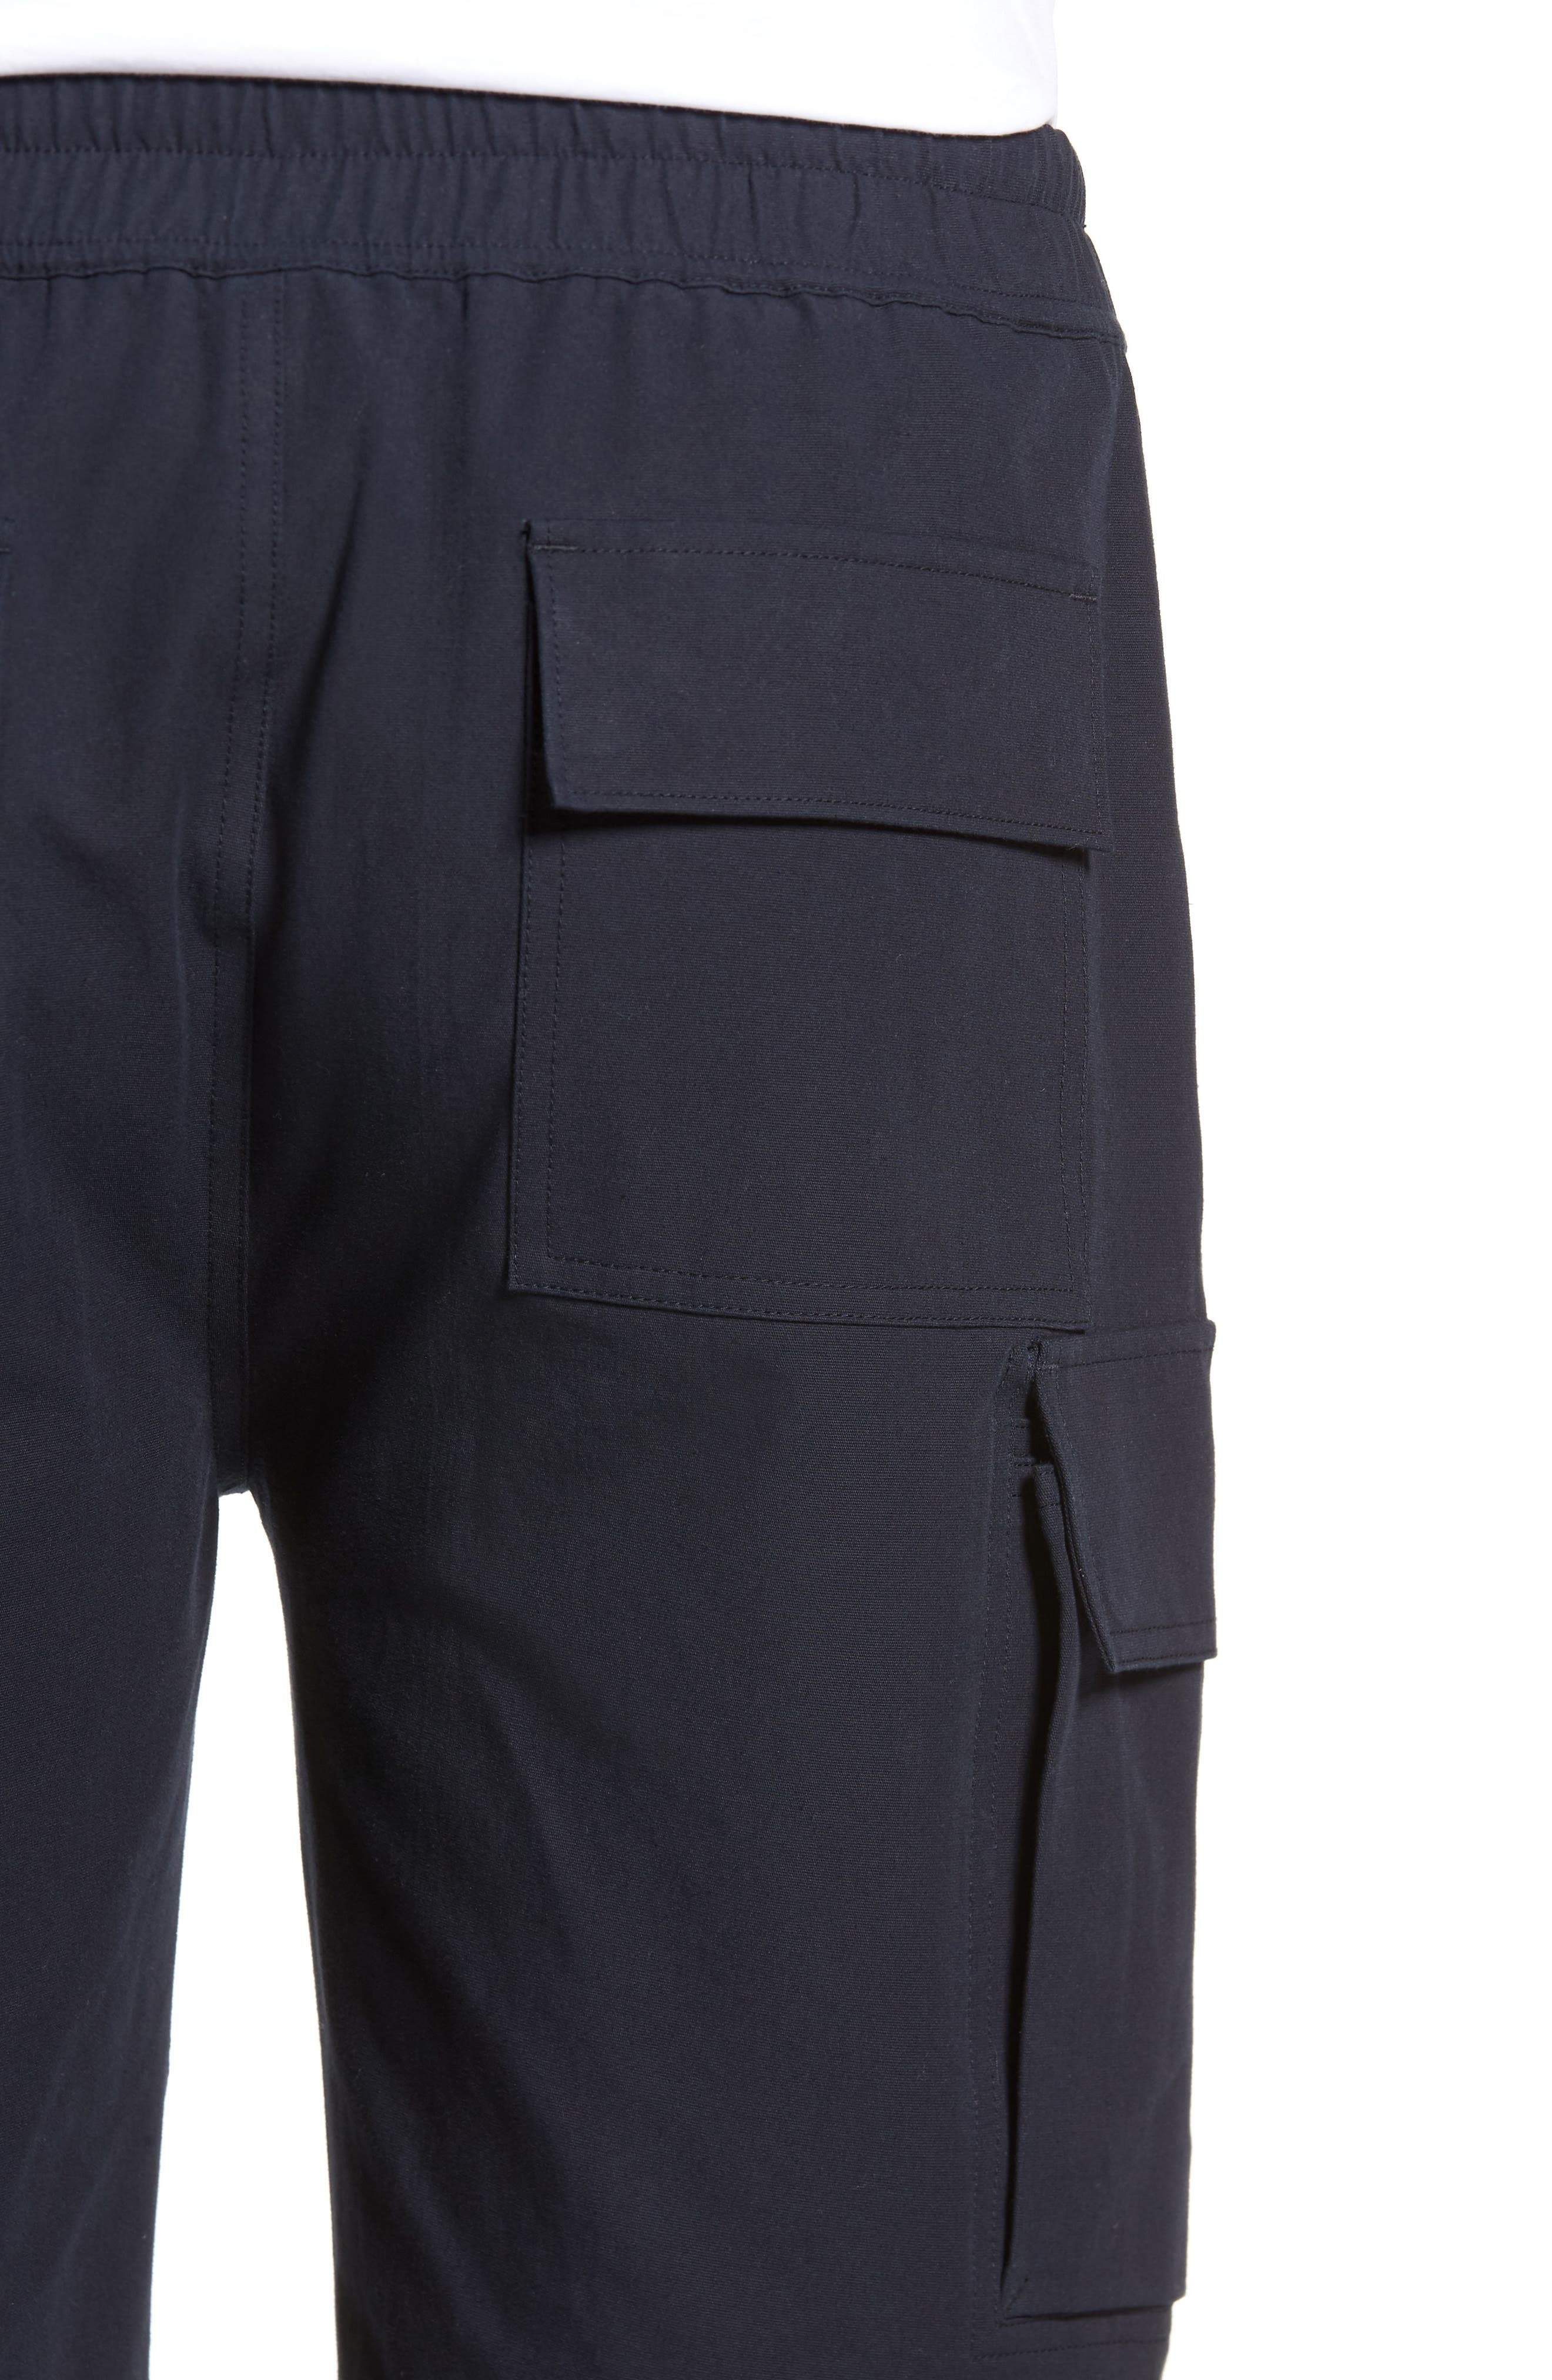 Regular Fit Drawstring Shorts,                             Alternate thumbnail 5, color,                             New Coastal